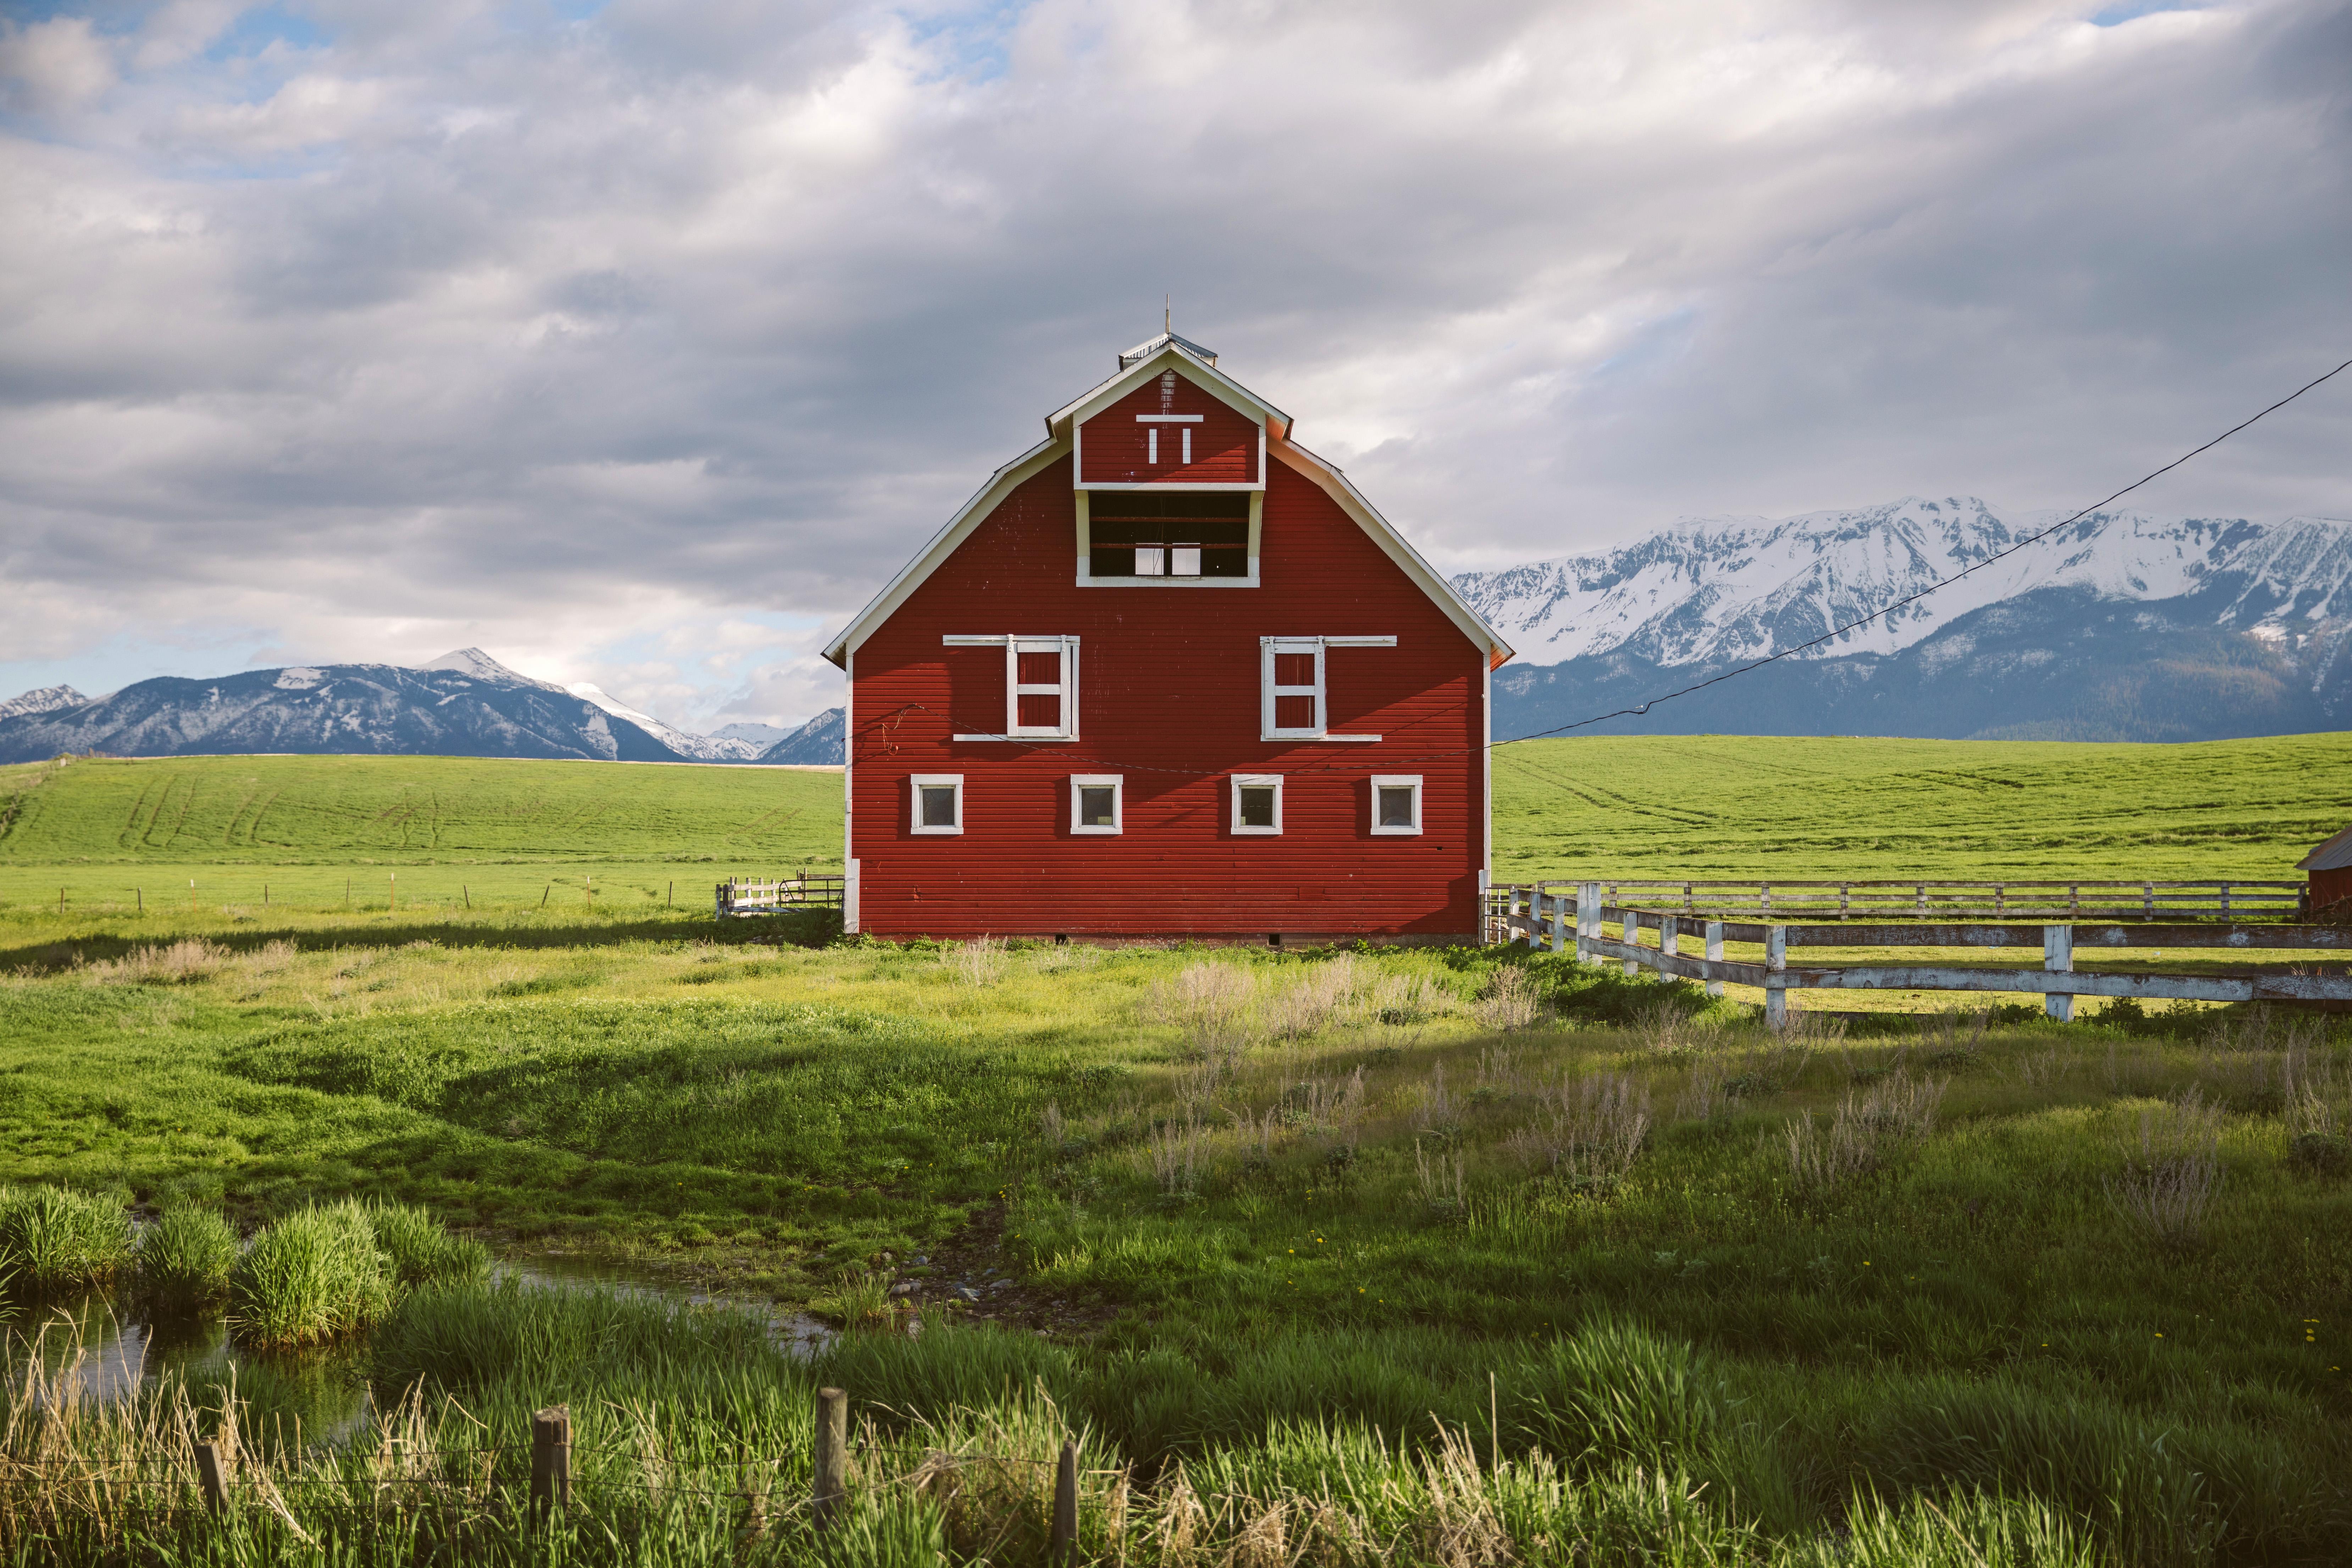 Red barn sitting center in beautiful green landscape in the Wallowas inEastern Oregon.